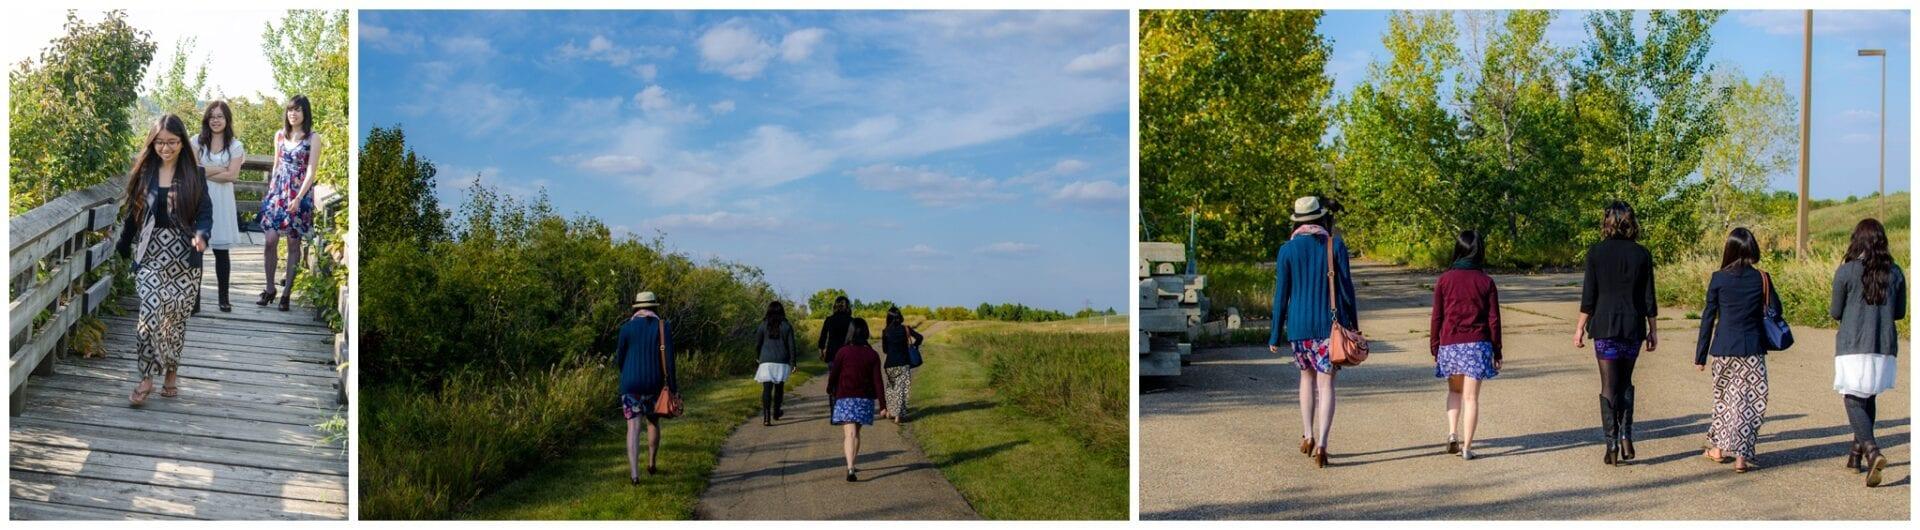 Sherwood Park Edmonton-scenery-bridge-forest-nature-mpstudio-004